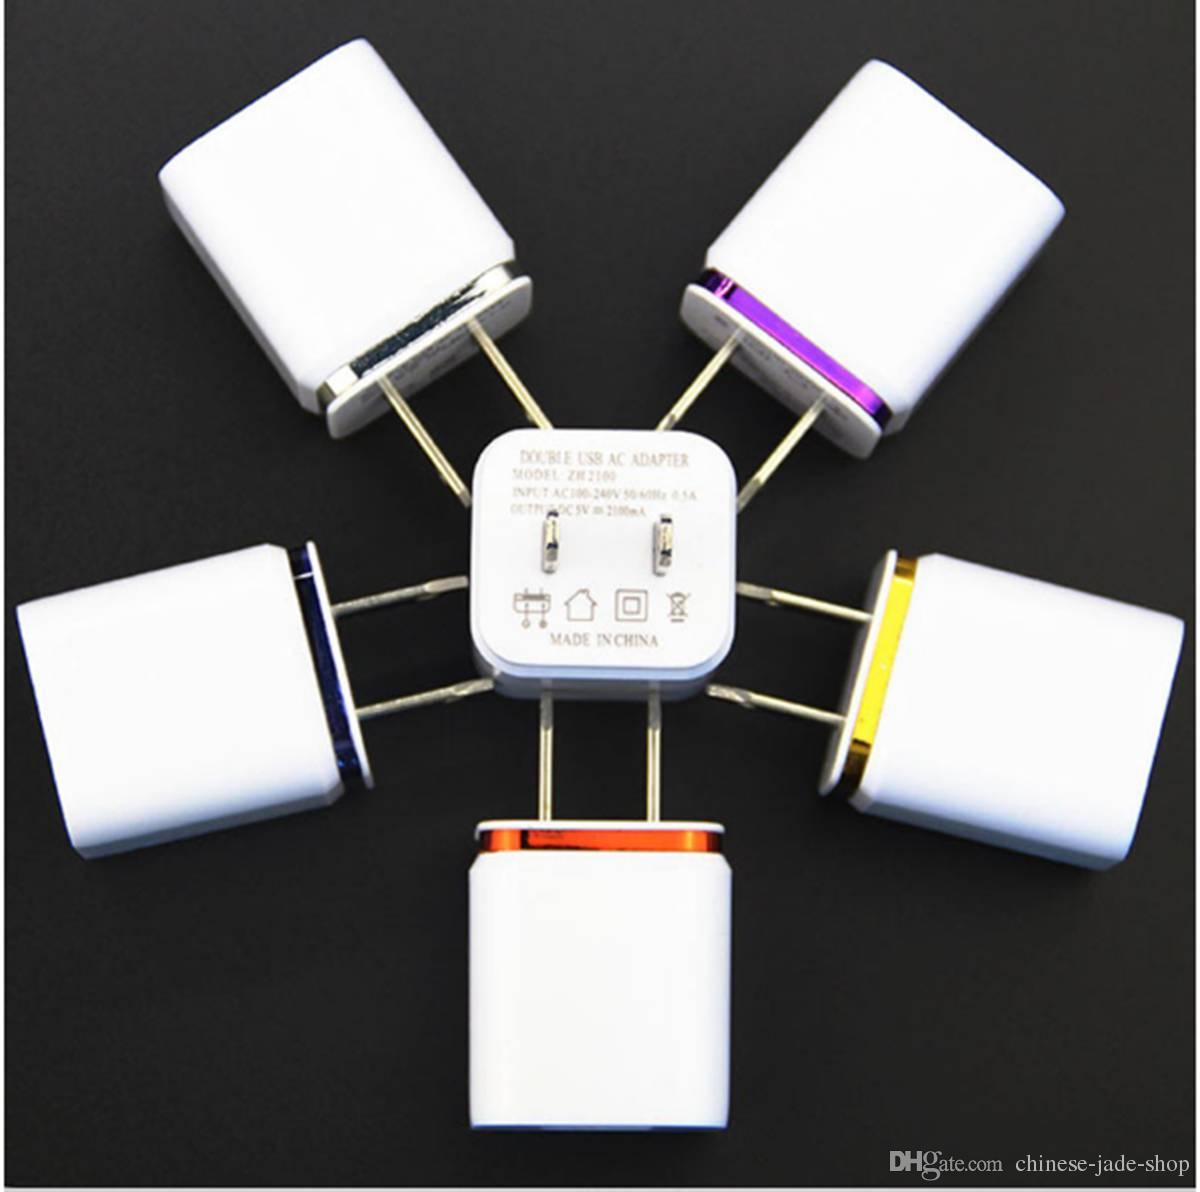 US Plug Metal Dual USB Wall Chargers AC Adapter 5 V 2.1A voor Smart Phone Pad 5 Color 100pcs / lot